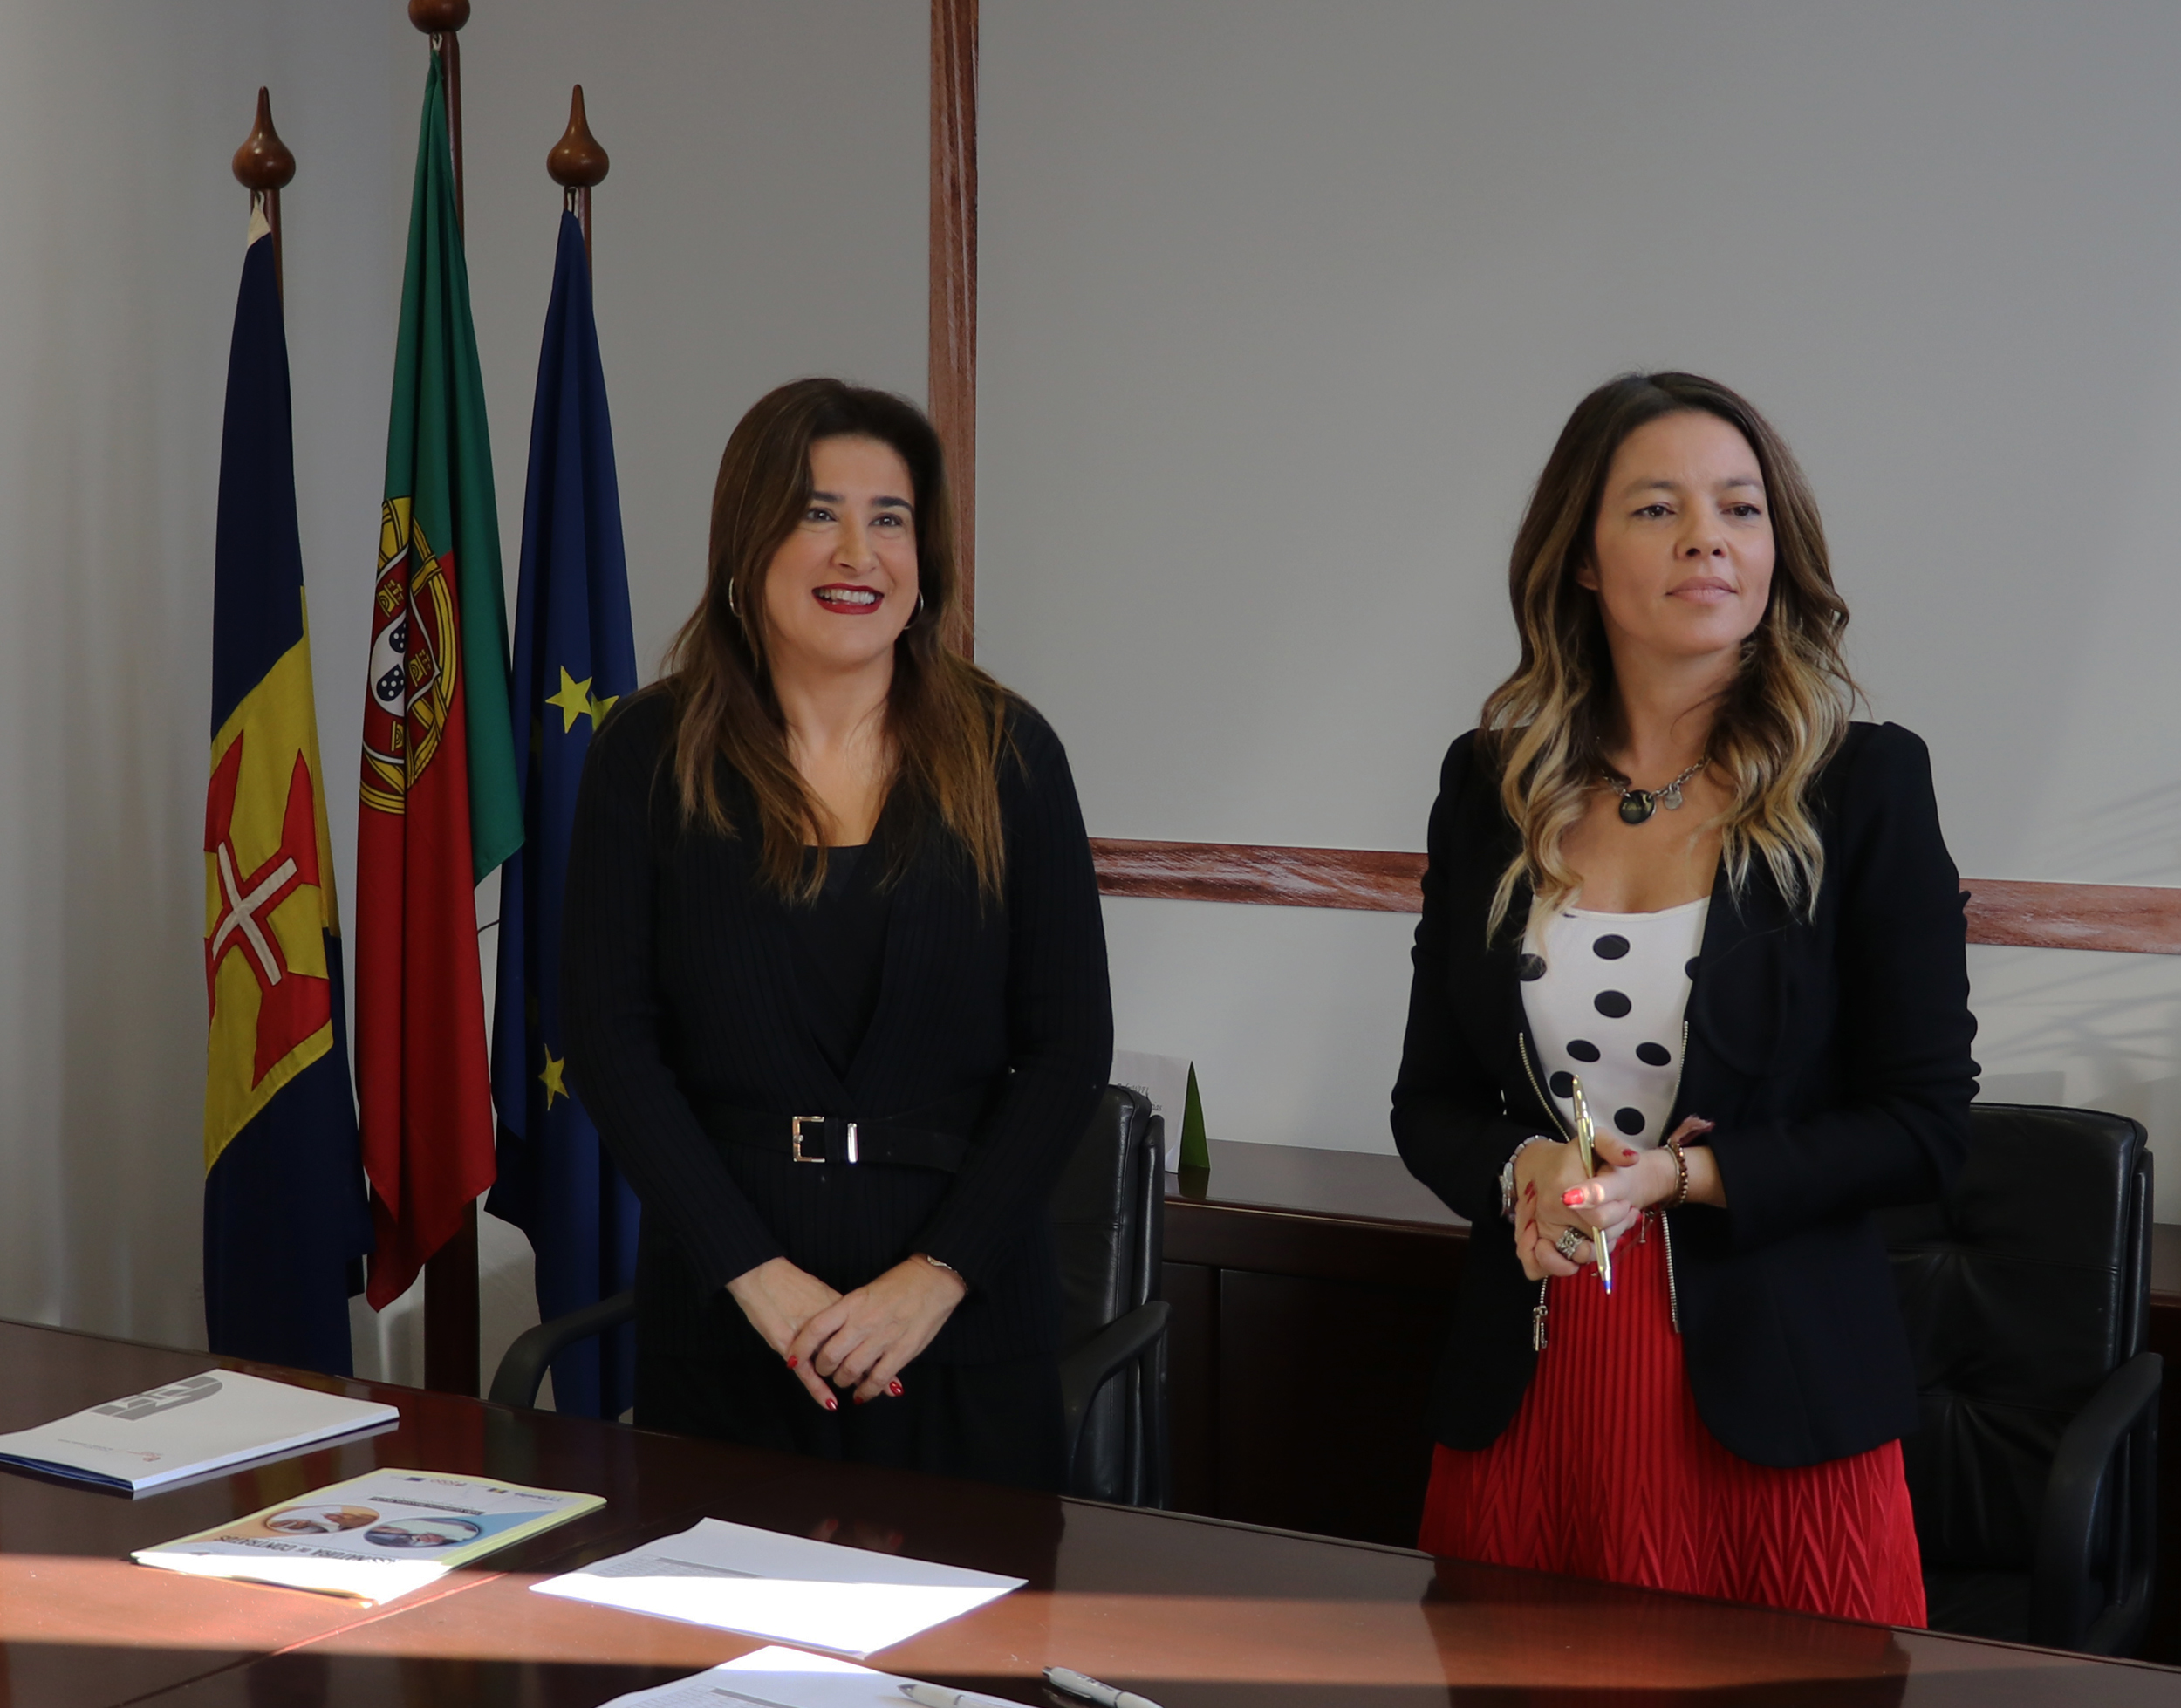 Programa de Apoio ao Reforço de Equipas Sociais e de Saúde será prorrogado até dezembro de 2020